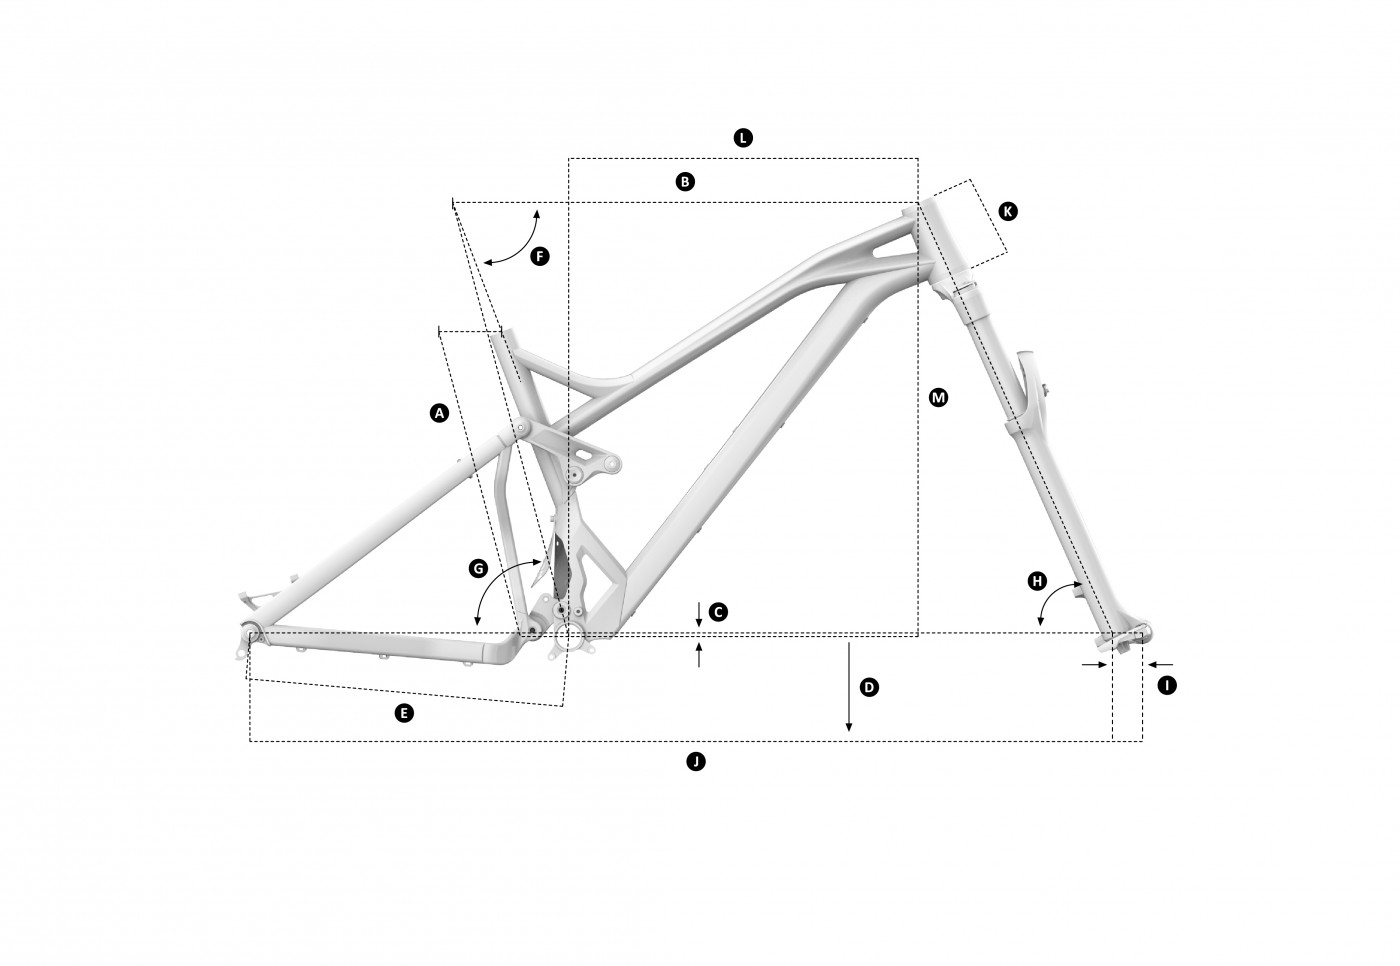 Geometria roweru Mondraker Dune